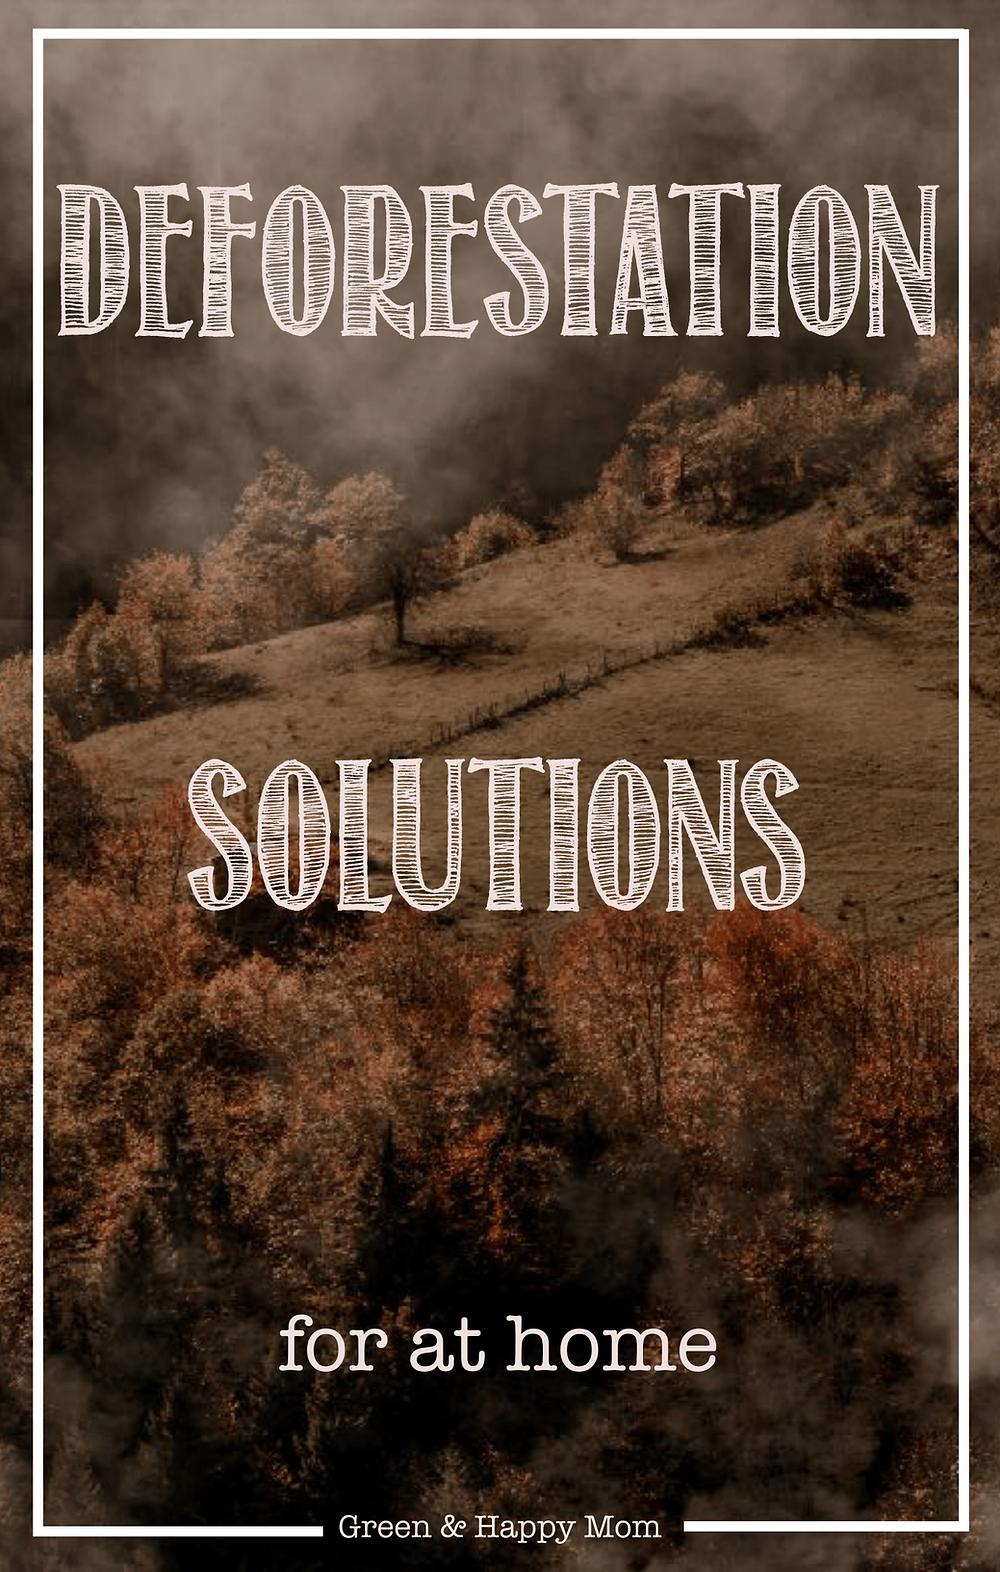 Deforestation solutions